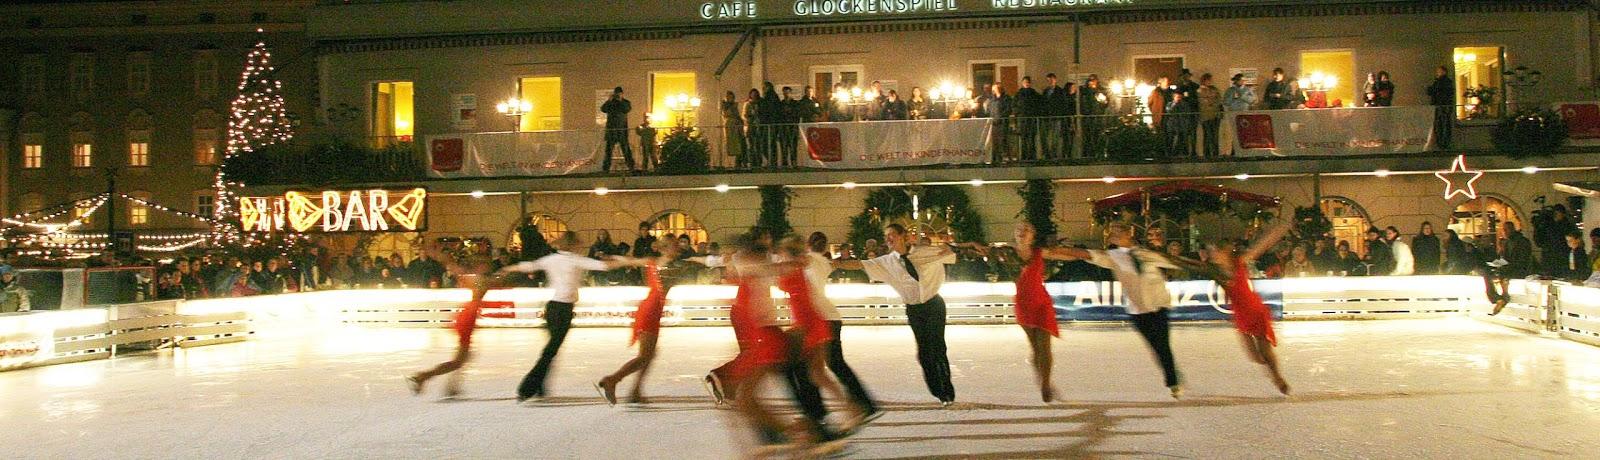 Mozarteis, Salzburg, Eishockey Charity, Sweet Mozart, Event konzept, Mozartplatz